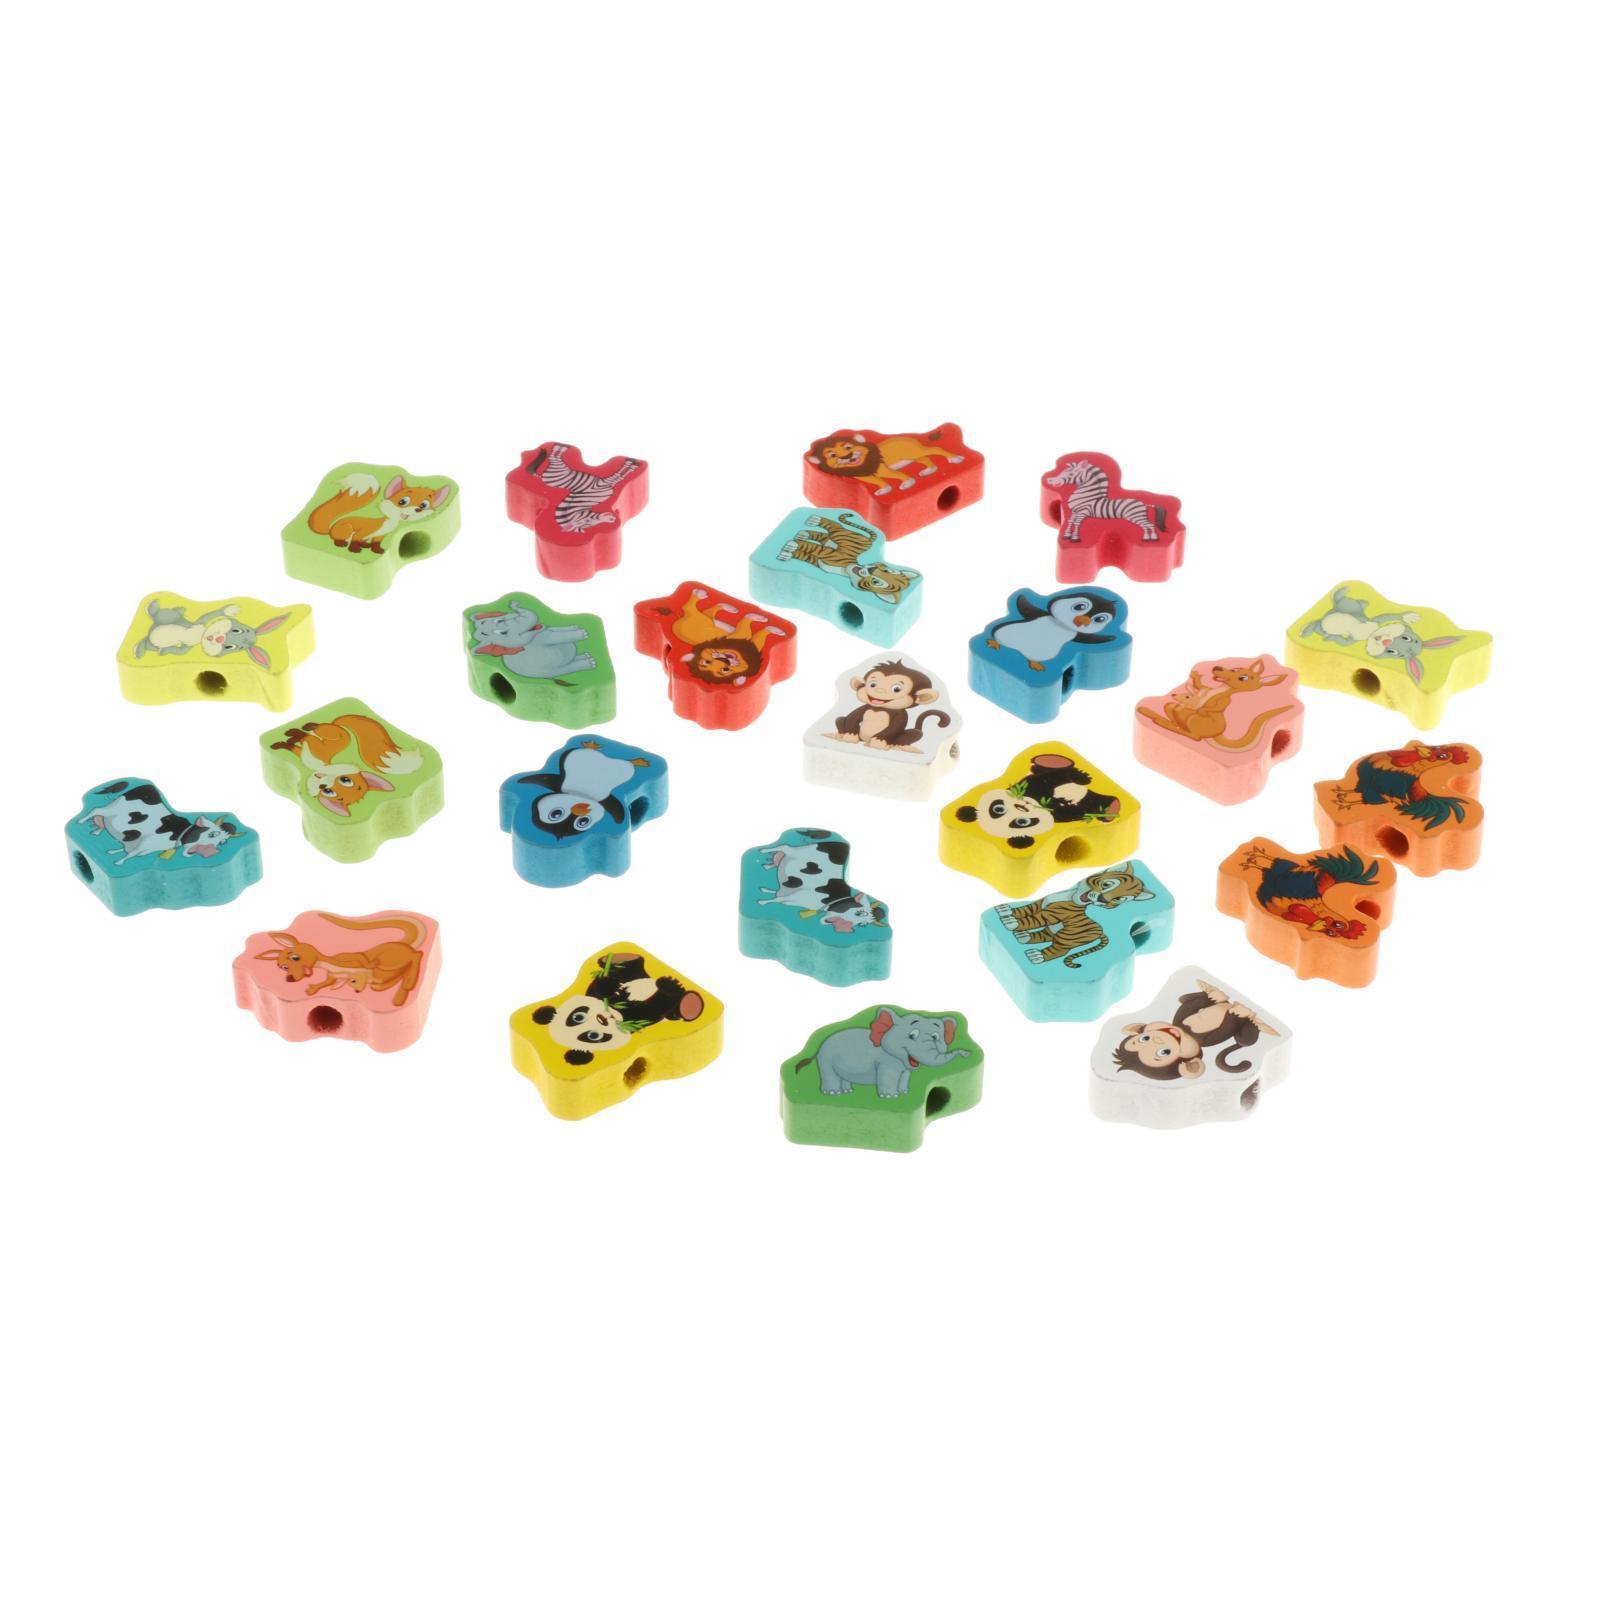 miniatura 20 - 24 pezzi di Legno FAI DA TE Perline Stringa Monterssori Le Capacità Motorie